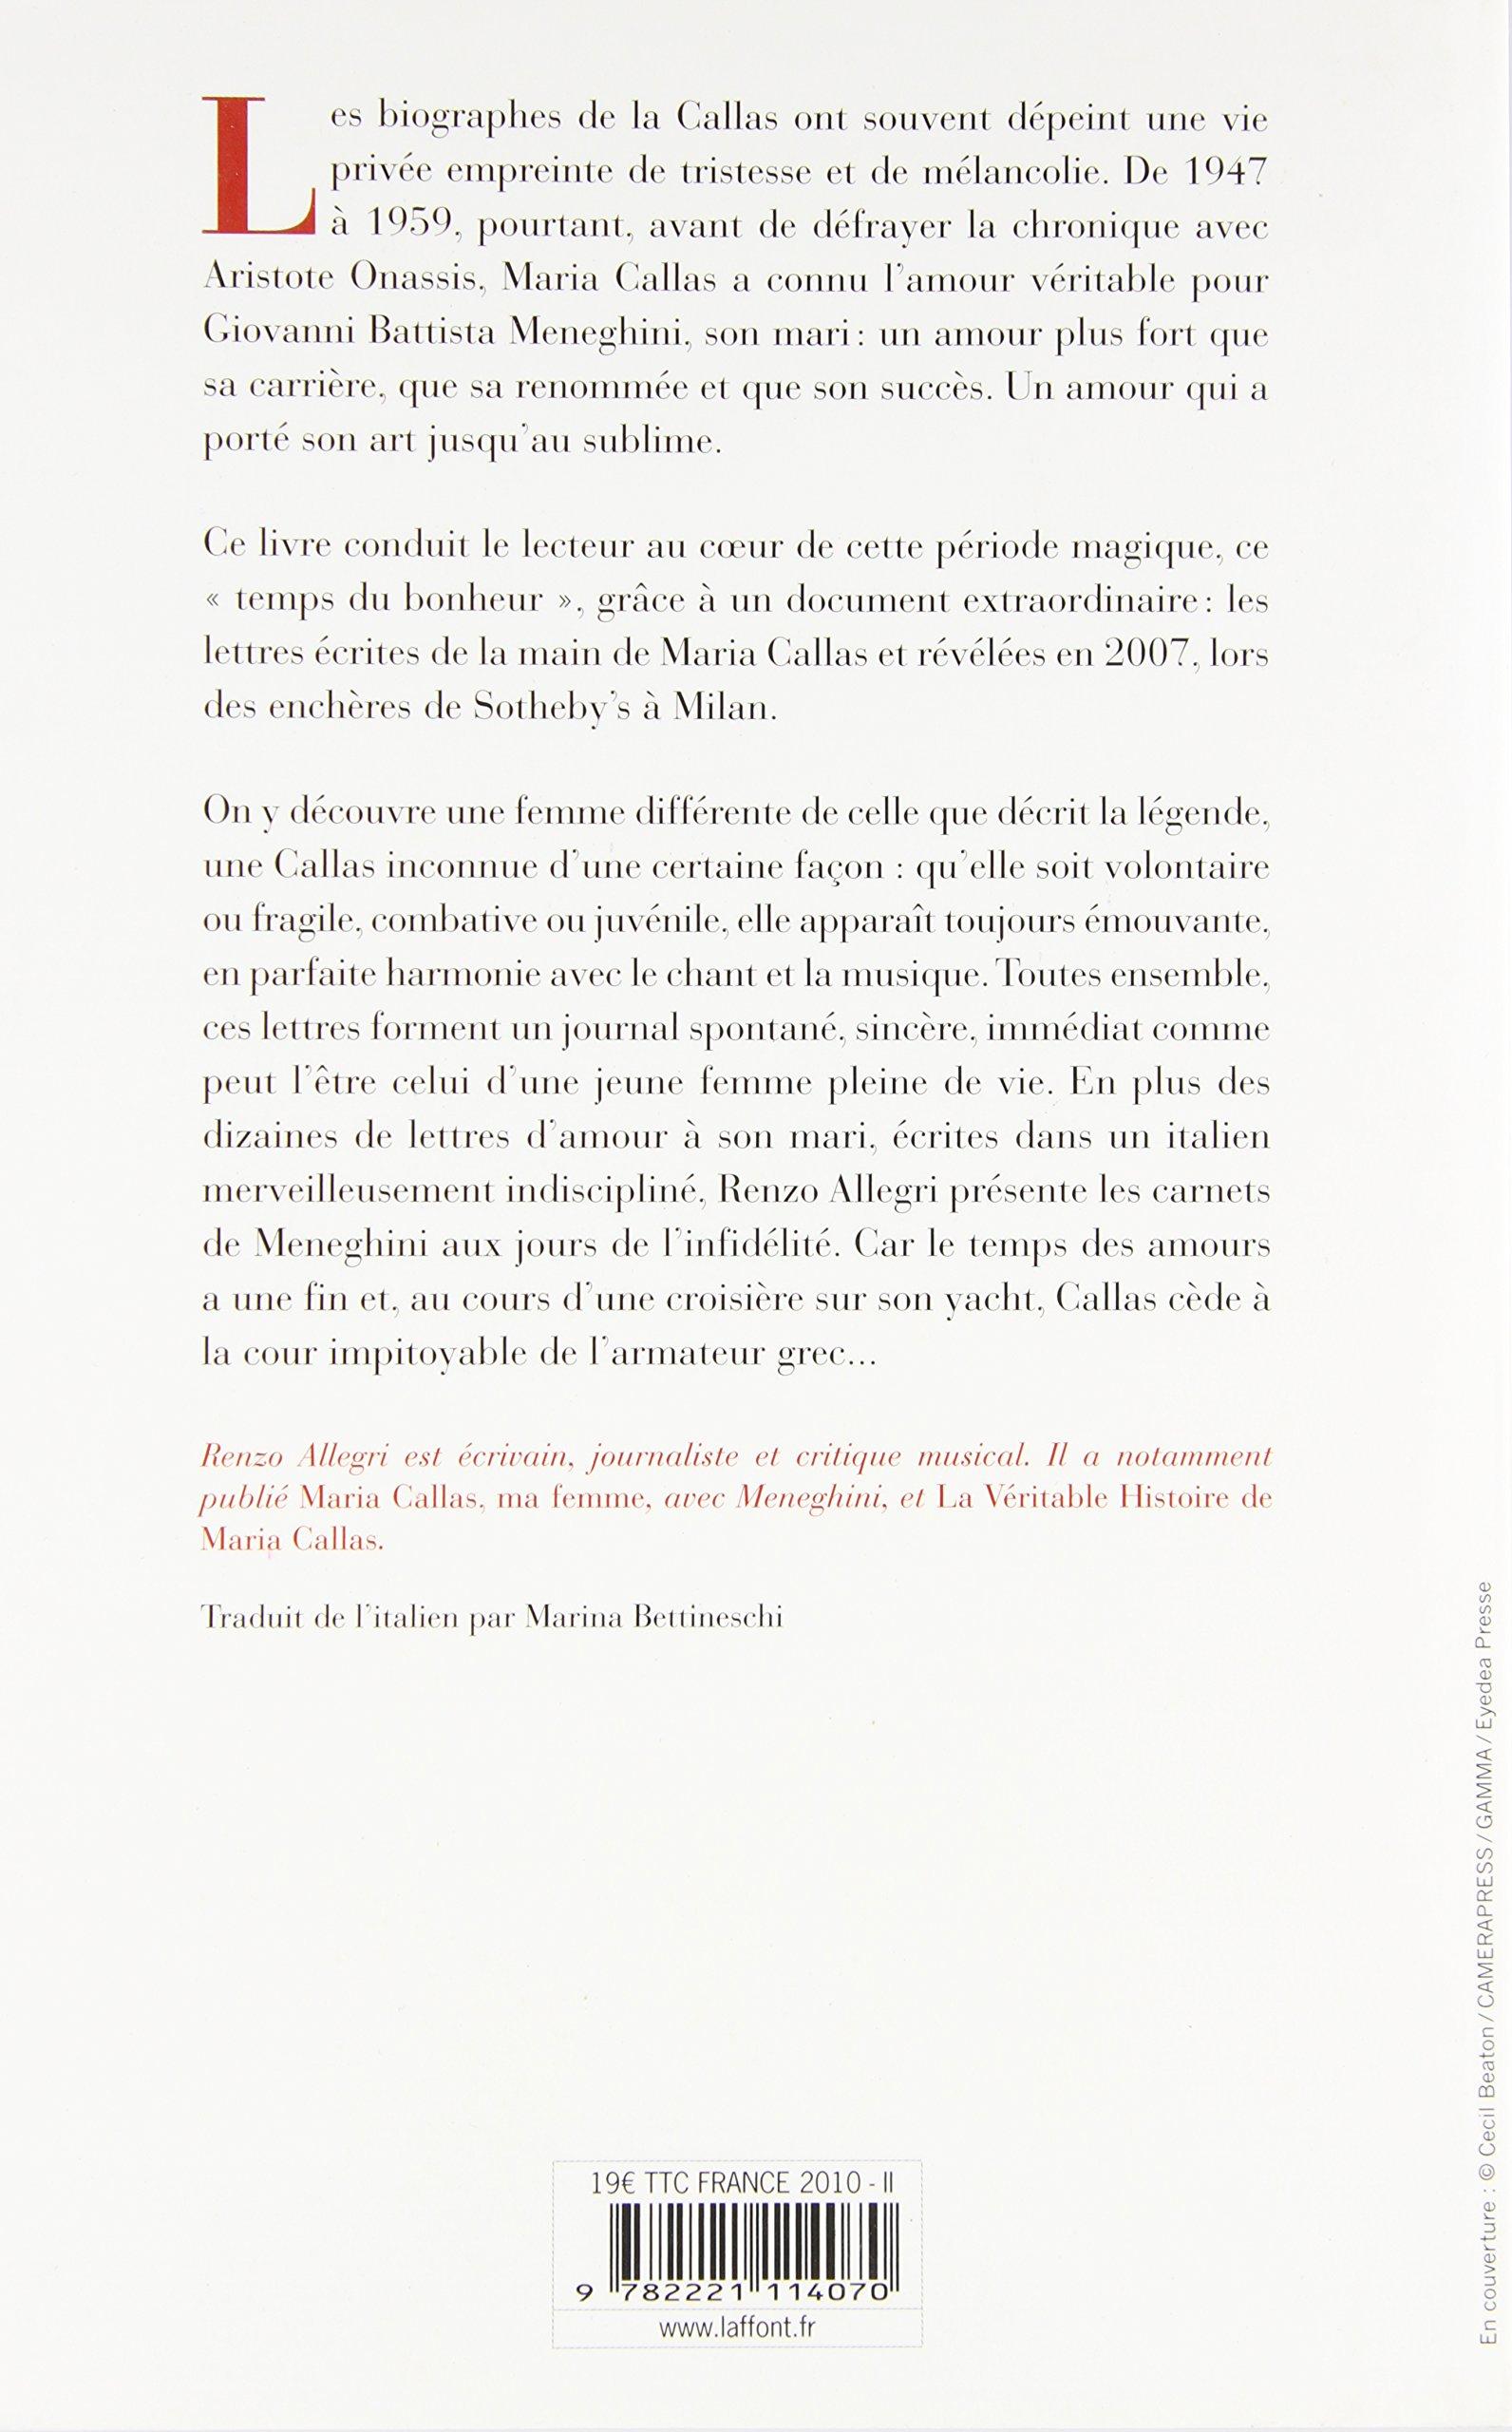 Maria Callas Lettres Damour Amazones Renzo Allegri